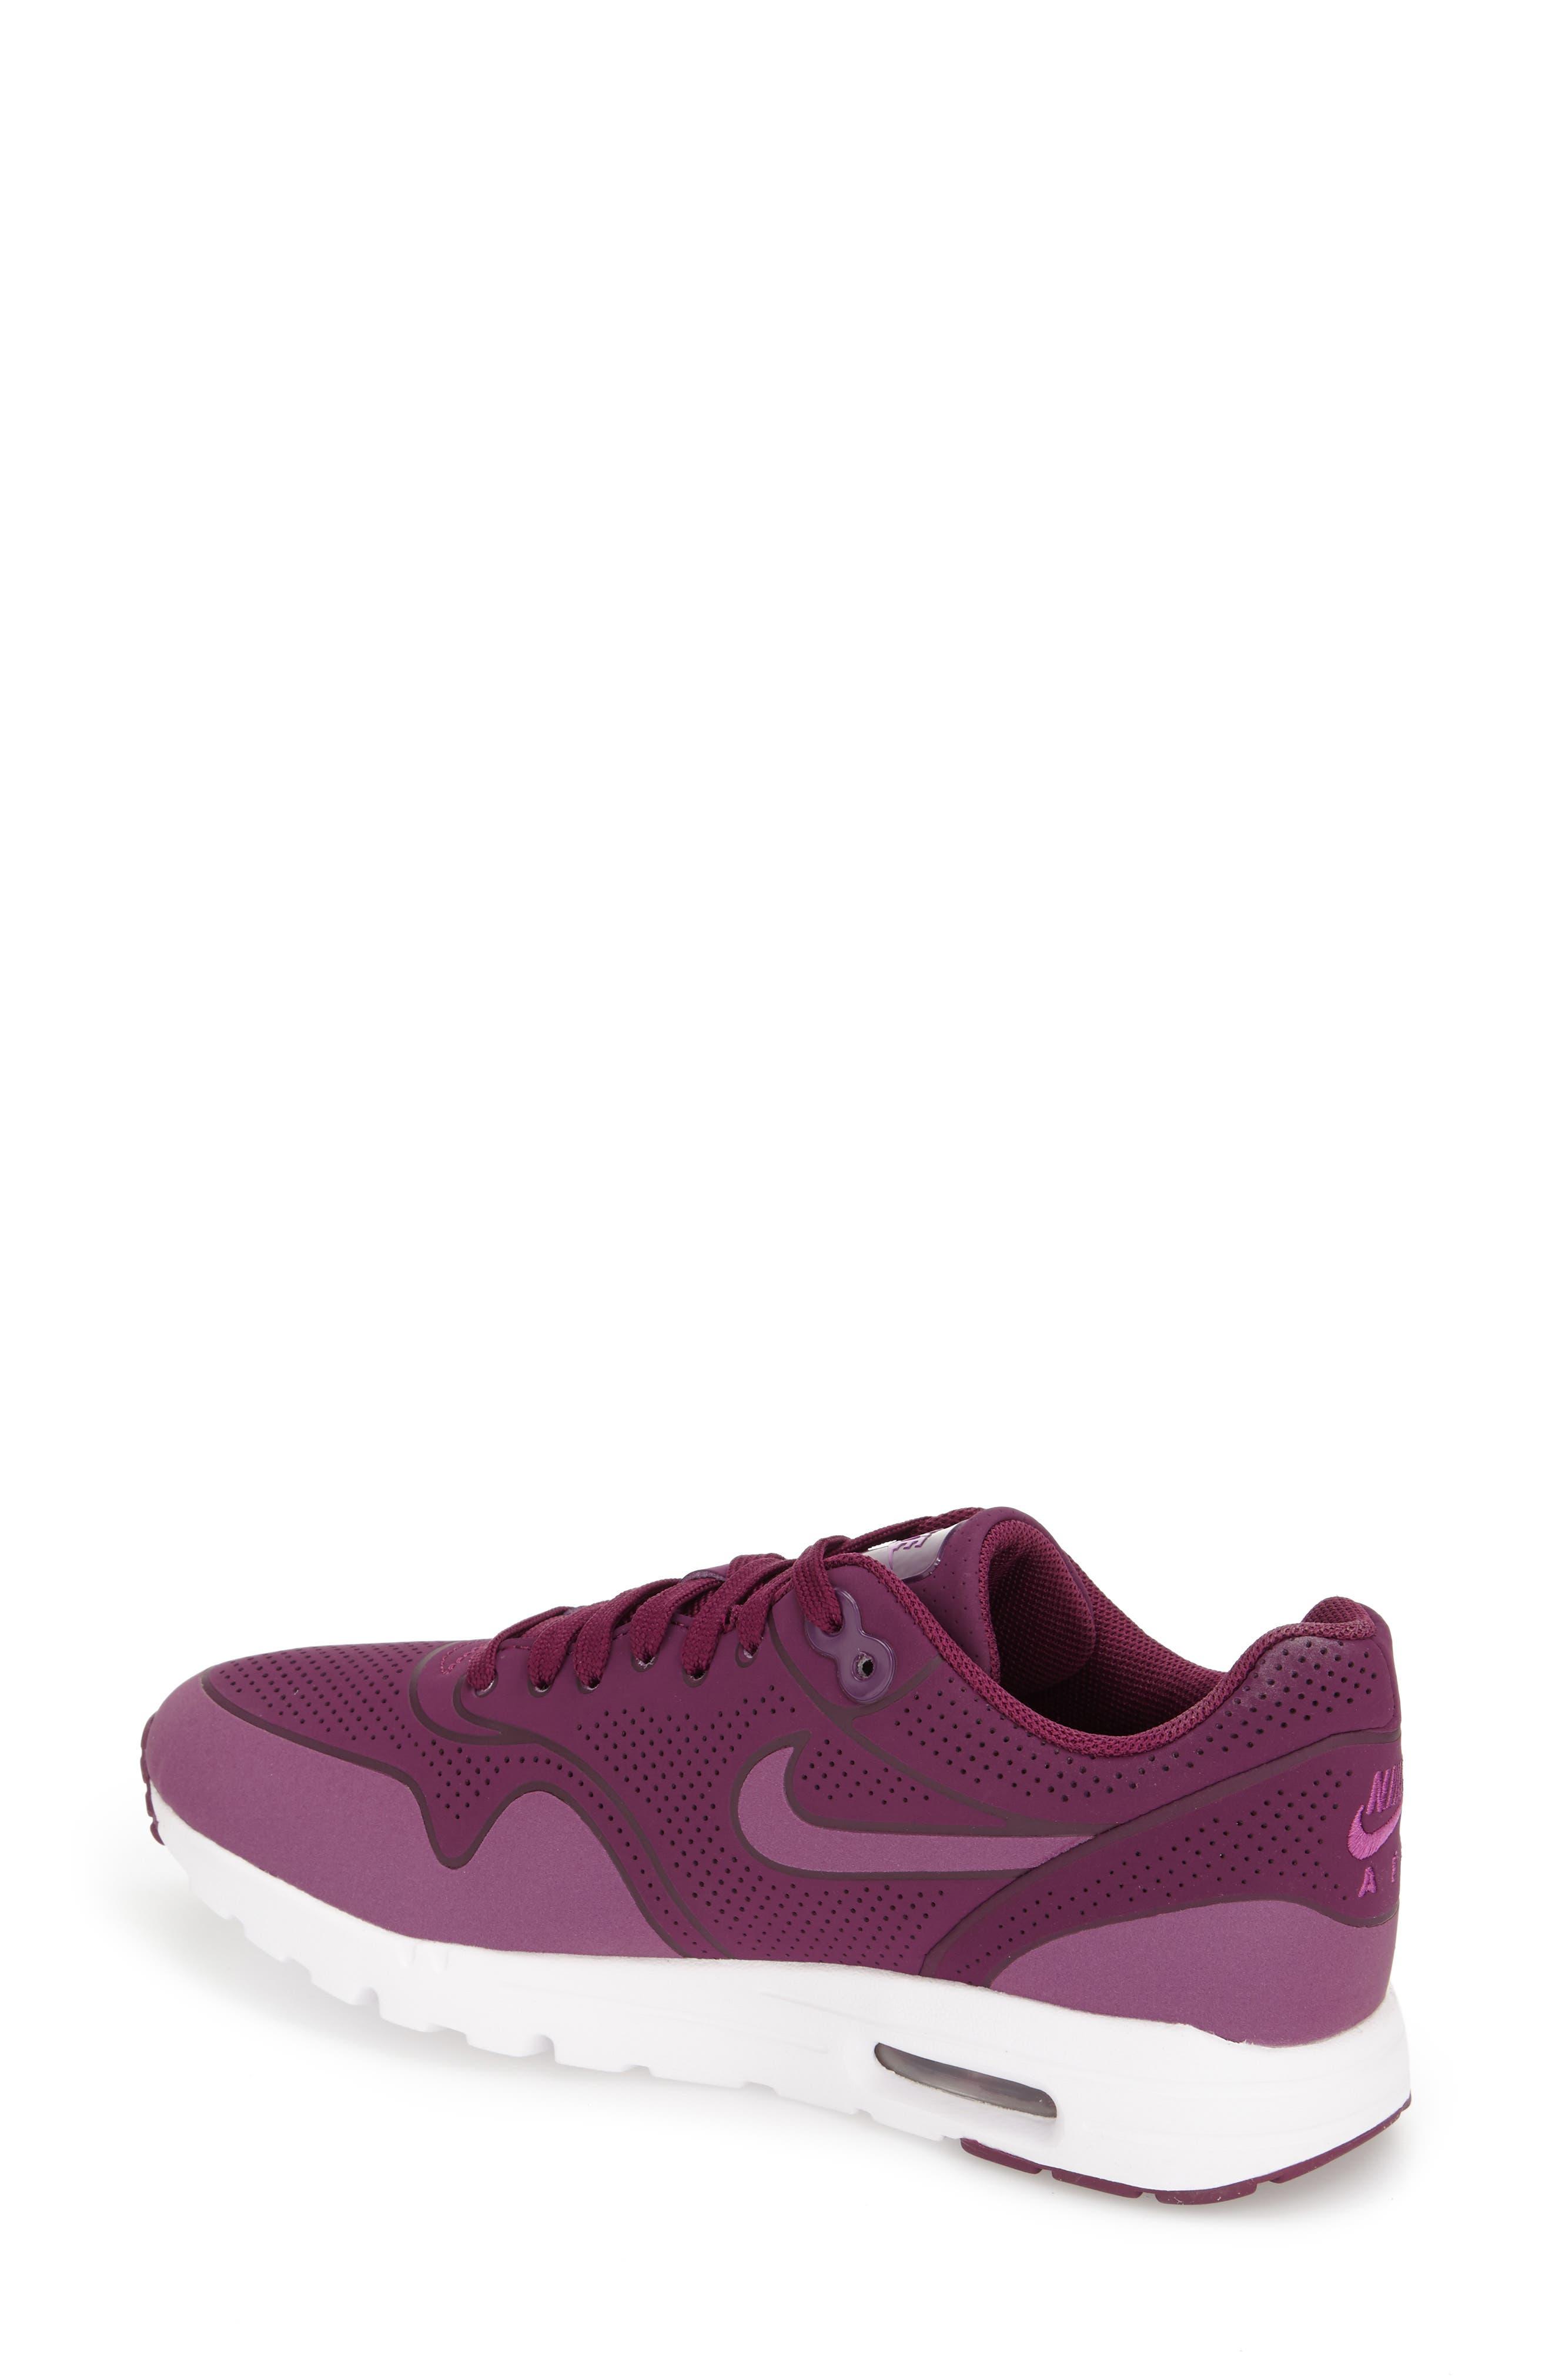 ,                             'Air Max 1 - Ultra Moire' Sneaker,                             Alternate thumbnail 91, color,                             500